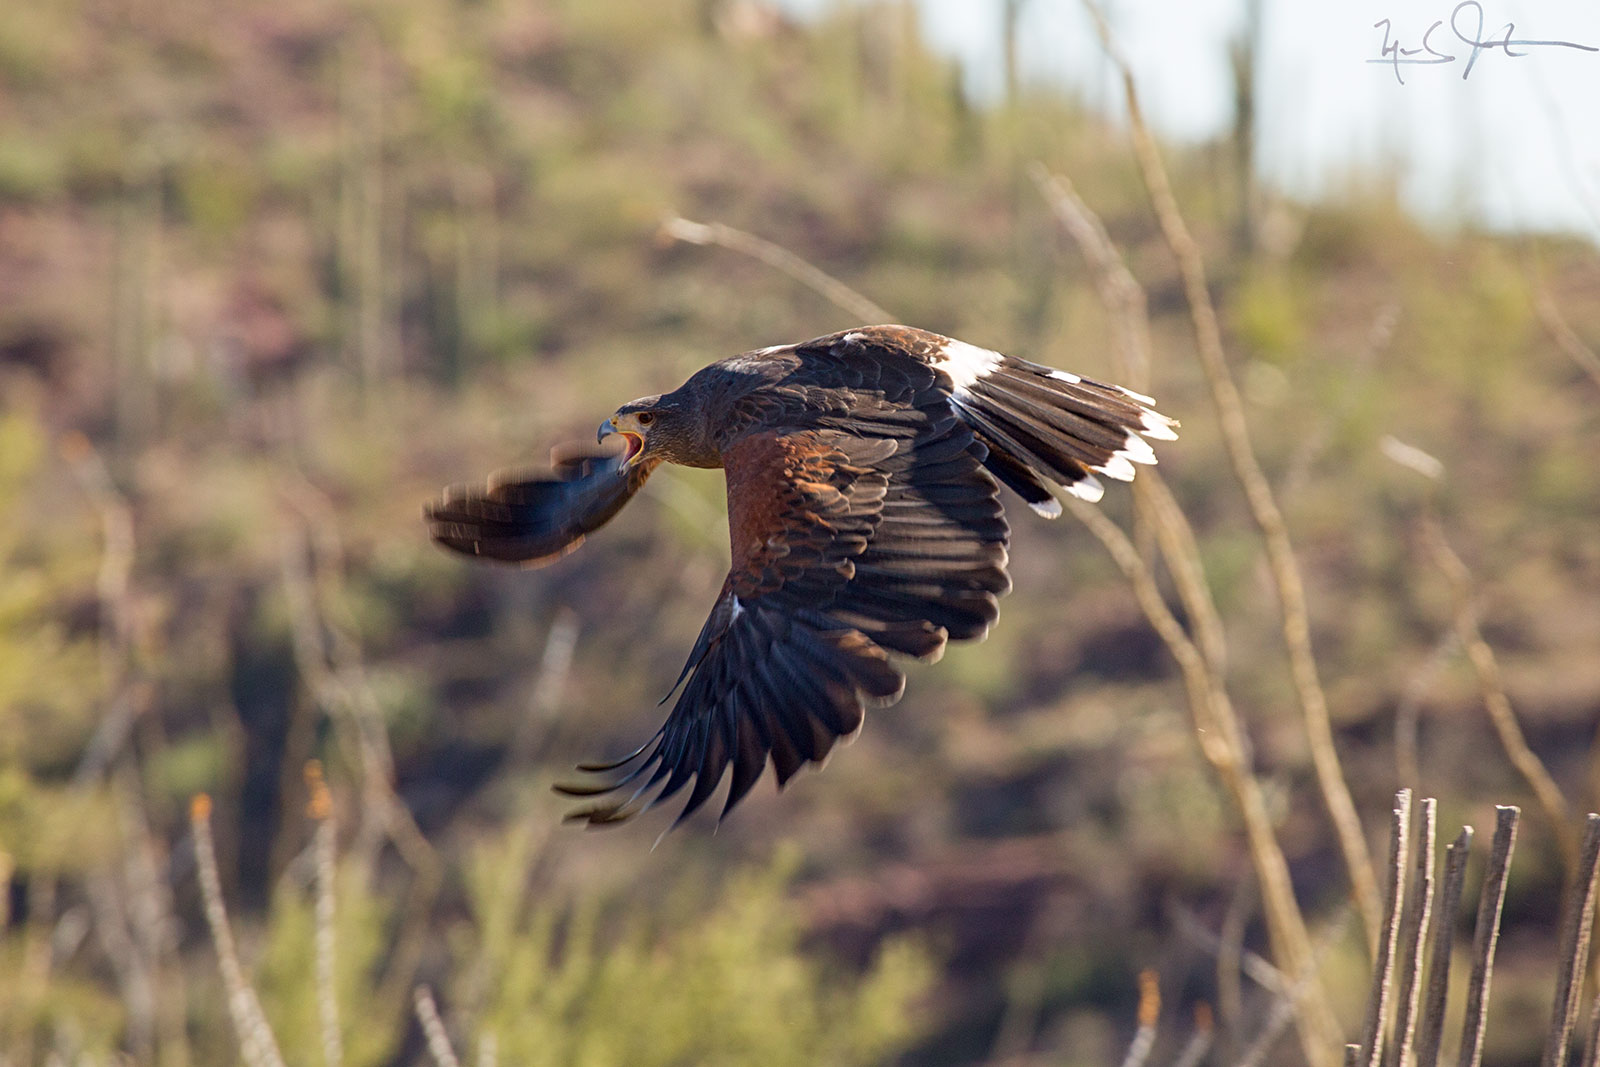 The Harris Hawk, Parabuteo unicinctus,  hunts in pairs or larger family groups.